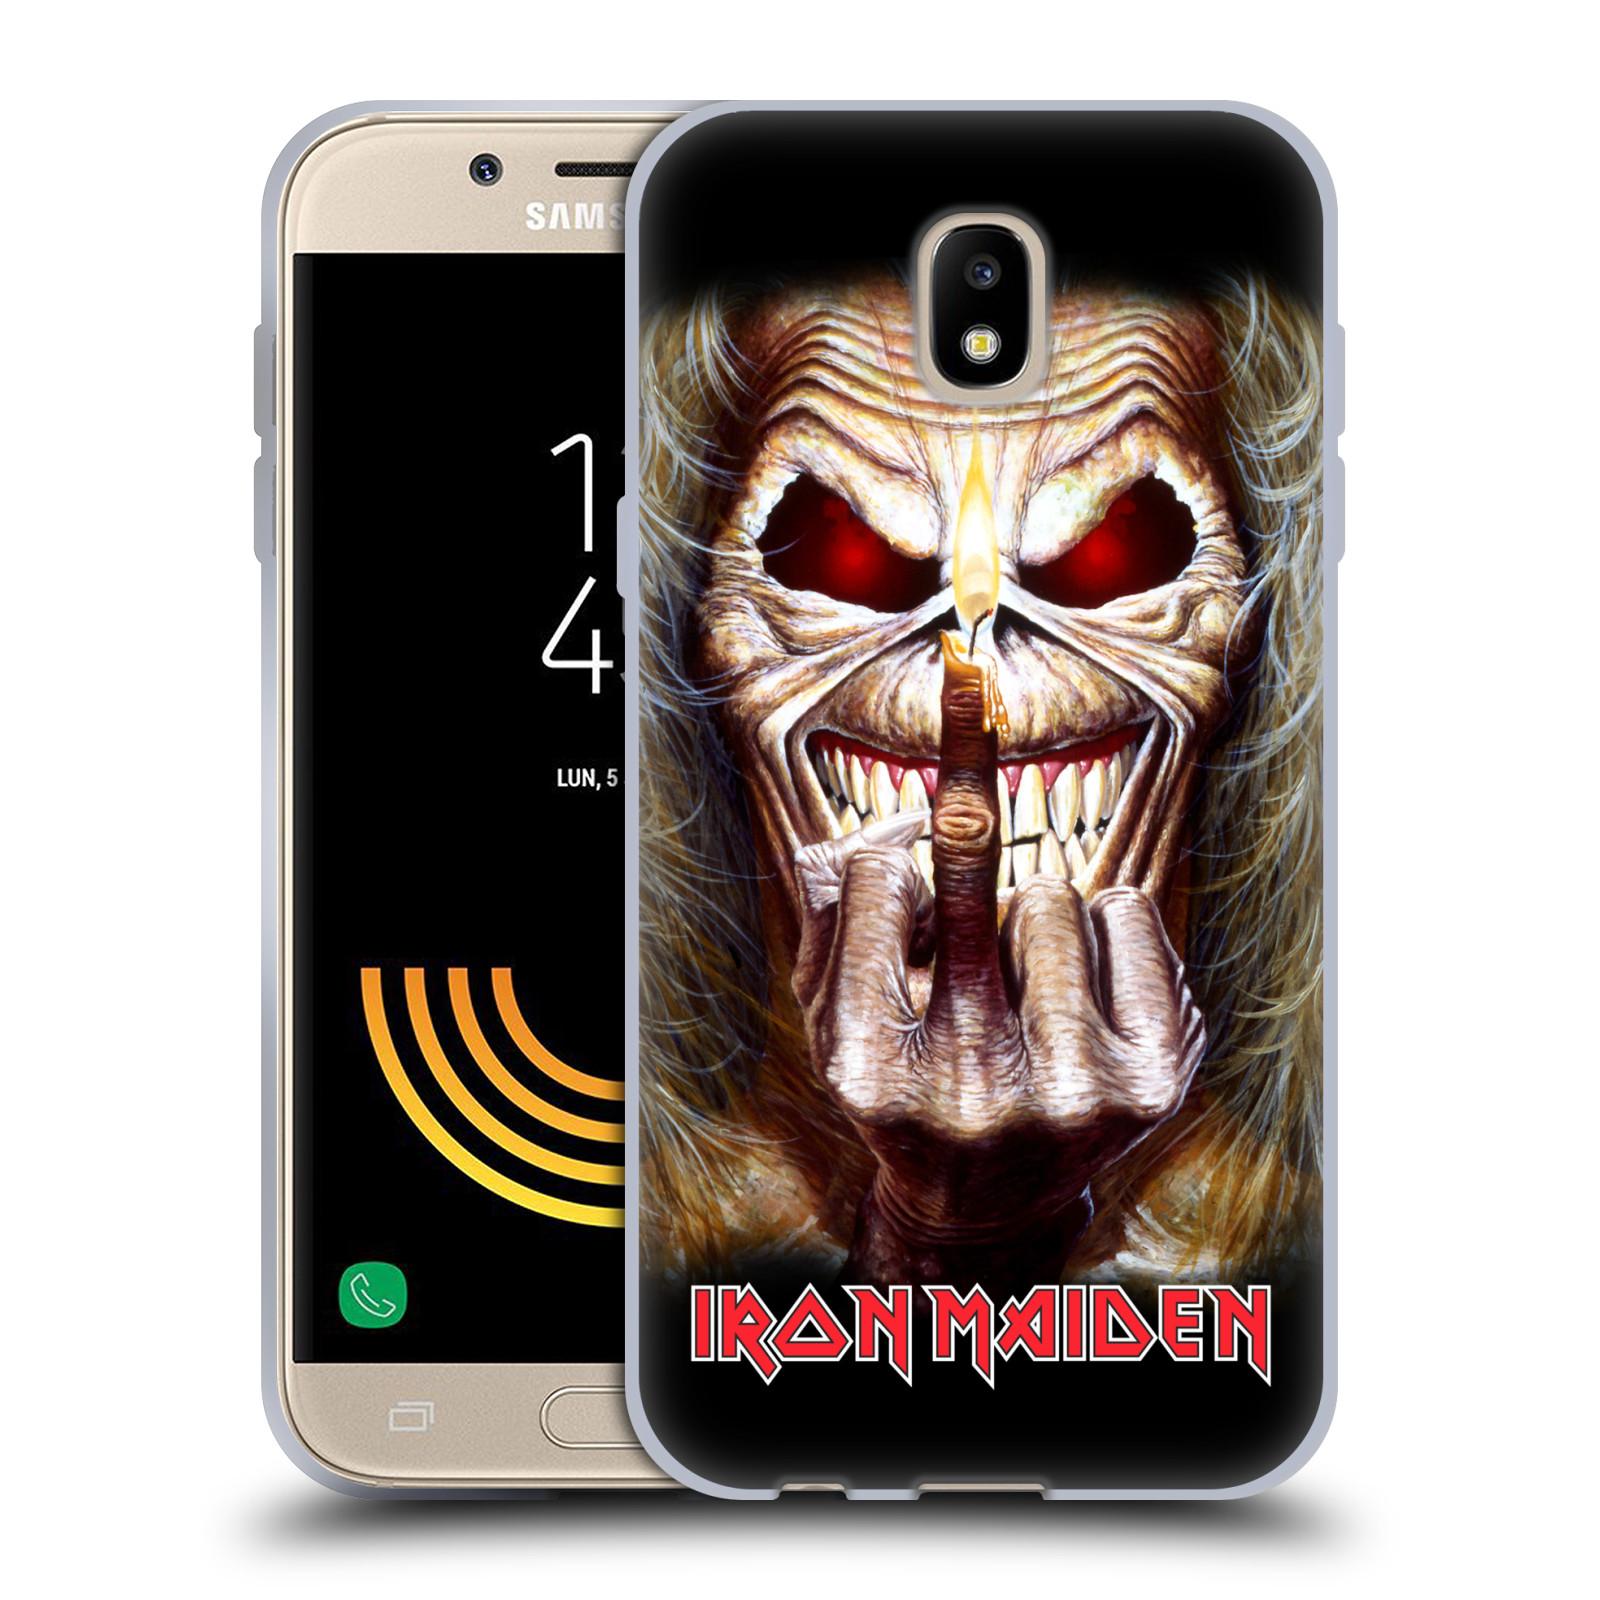 Silikonové pouzdro na mobil Samsung Galaxy J5 (2017) - Head Case - Iron Maiden - Candle Finger